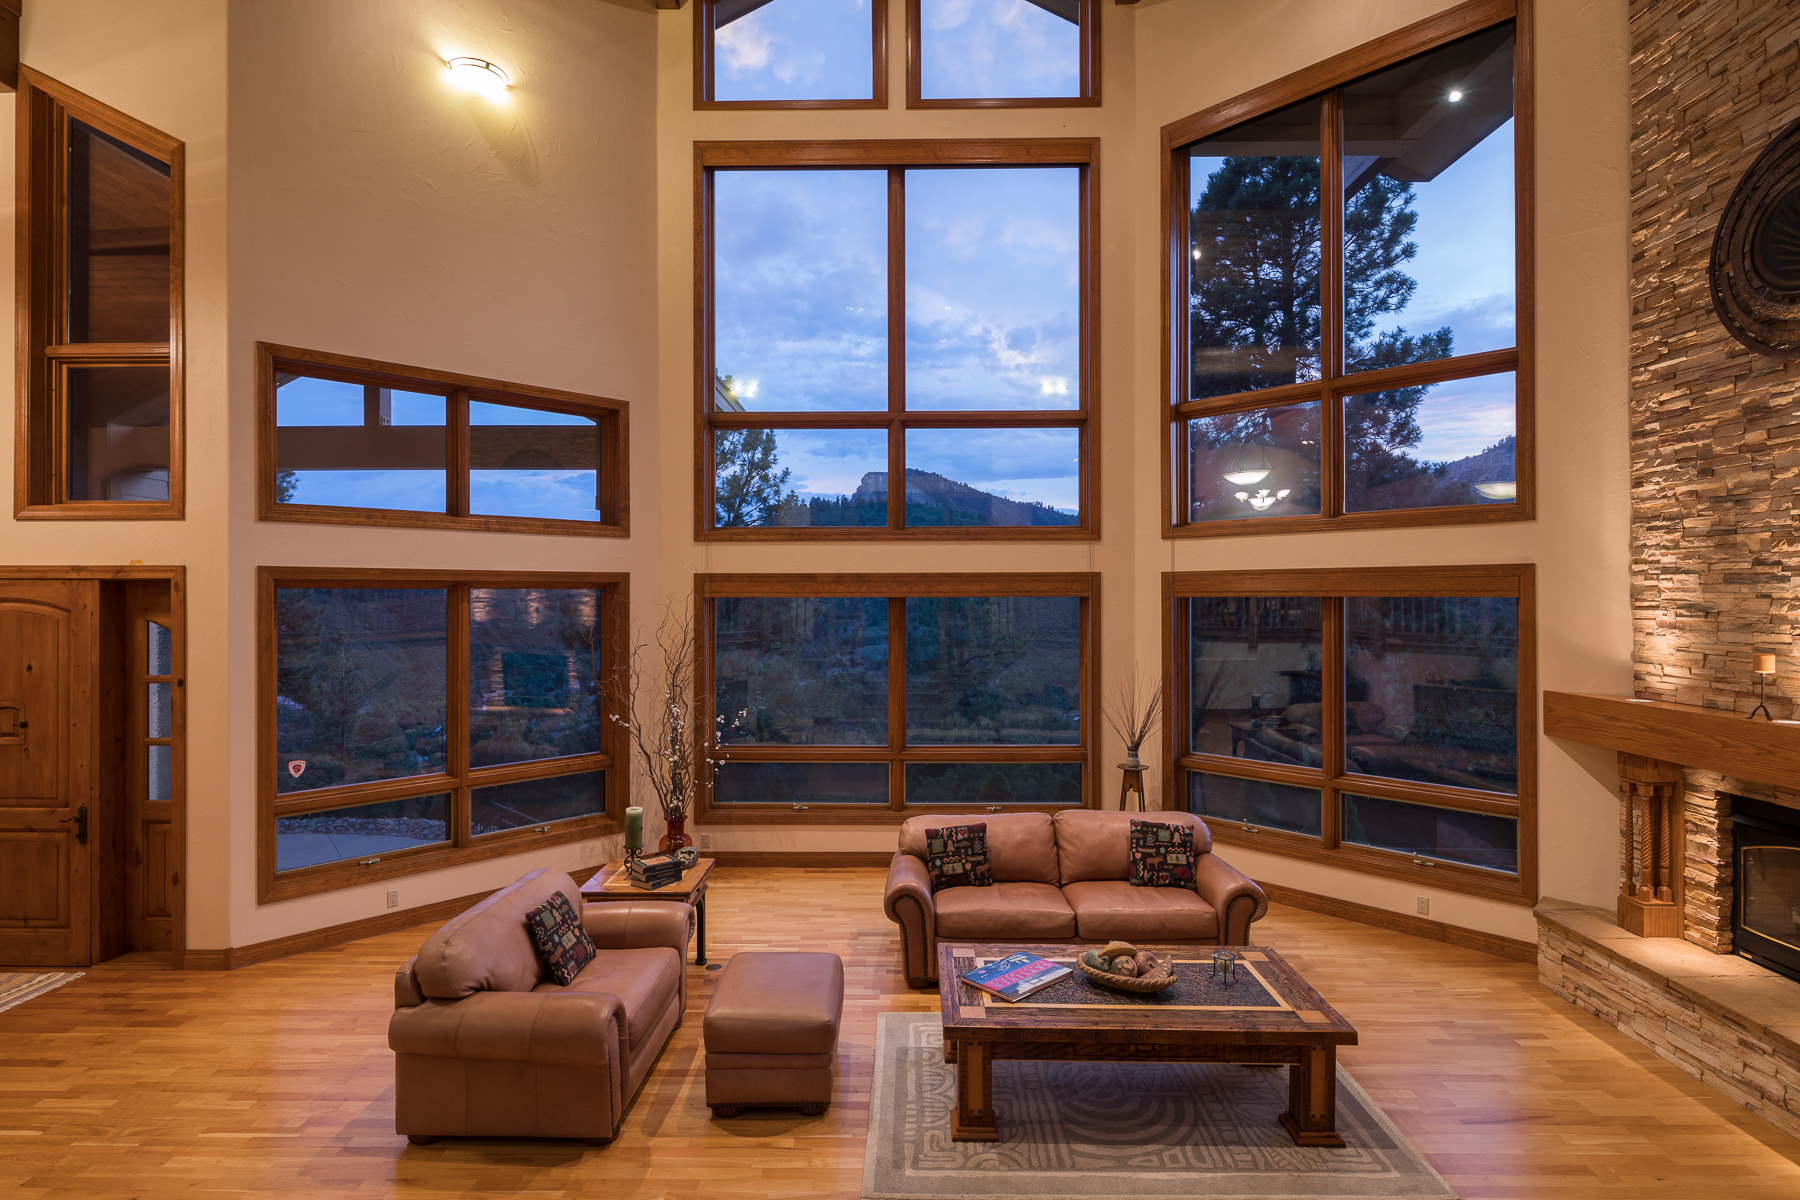 Additional photo for property listing at 40 Perins Vista 40 Perins Vista Drive 杜兰戈, 科罗拉多州 81301 美国